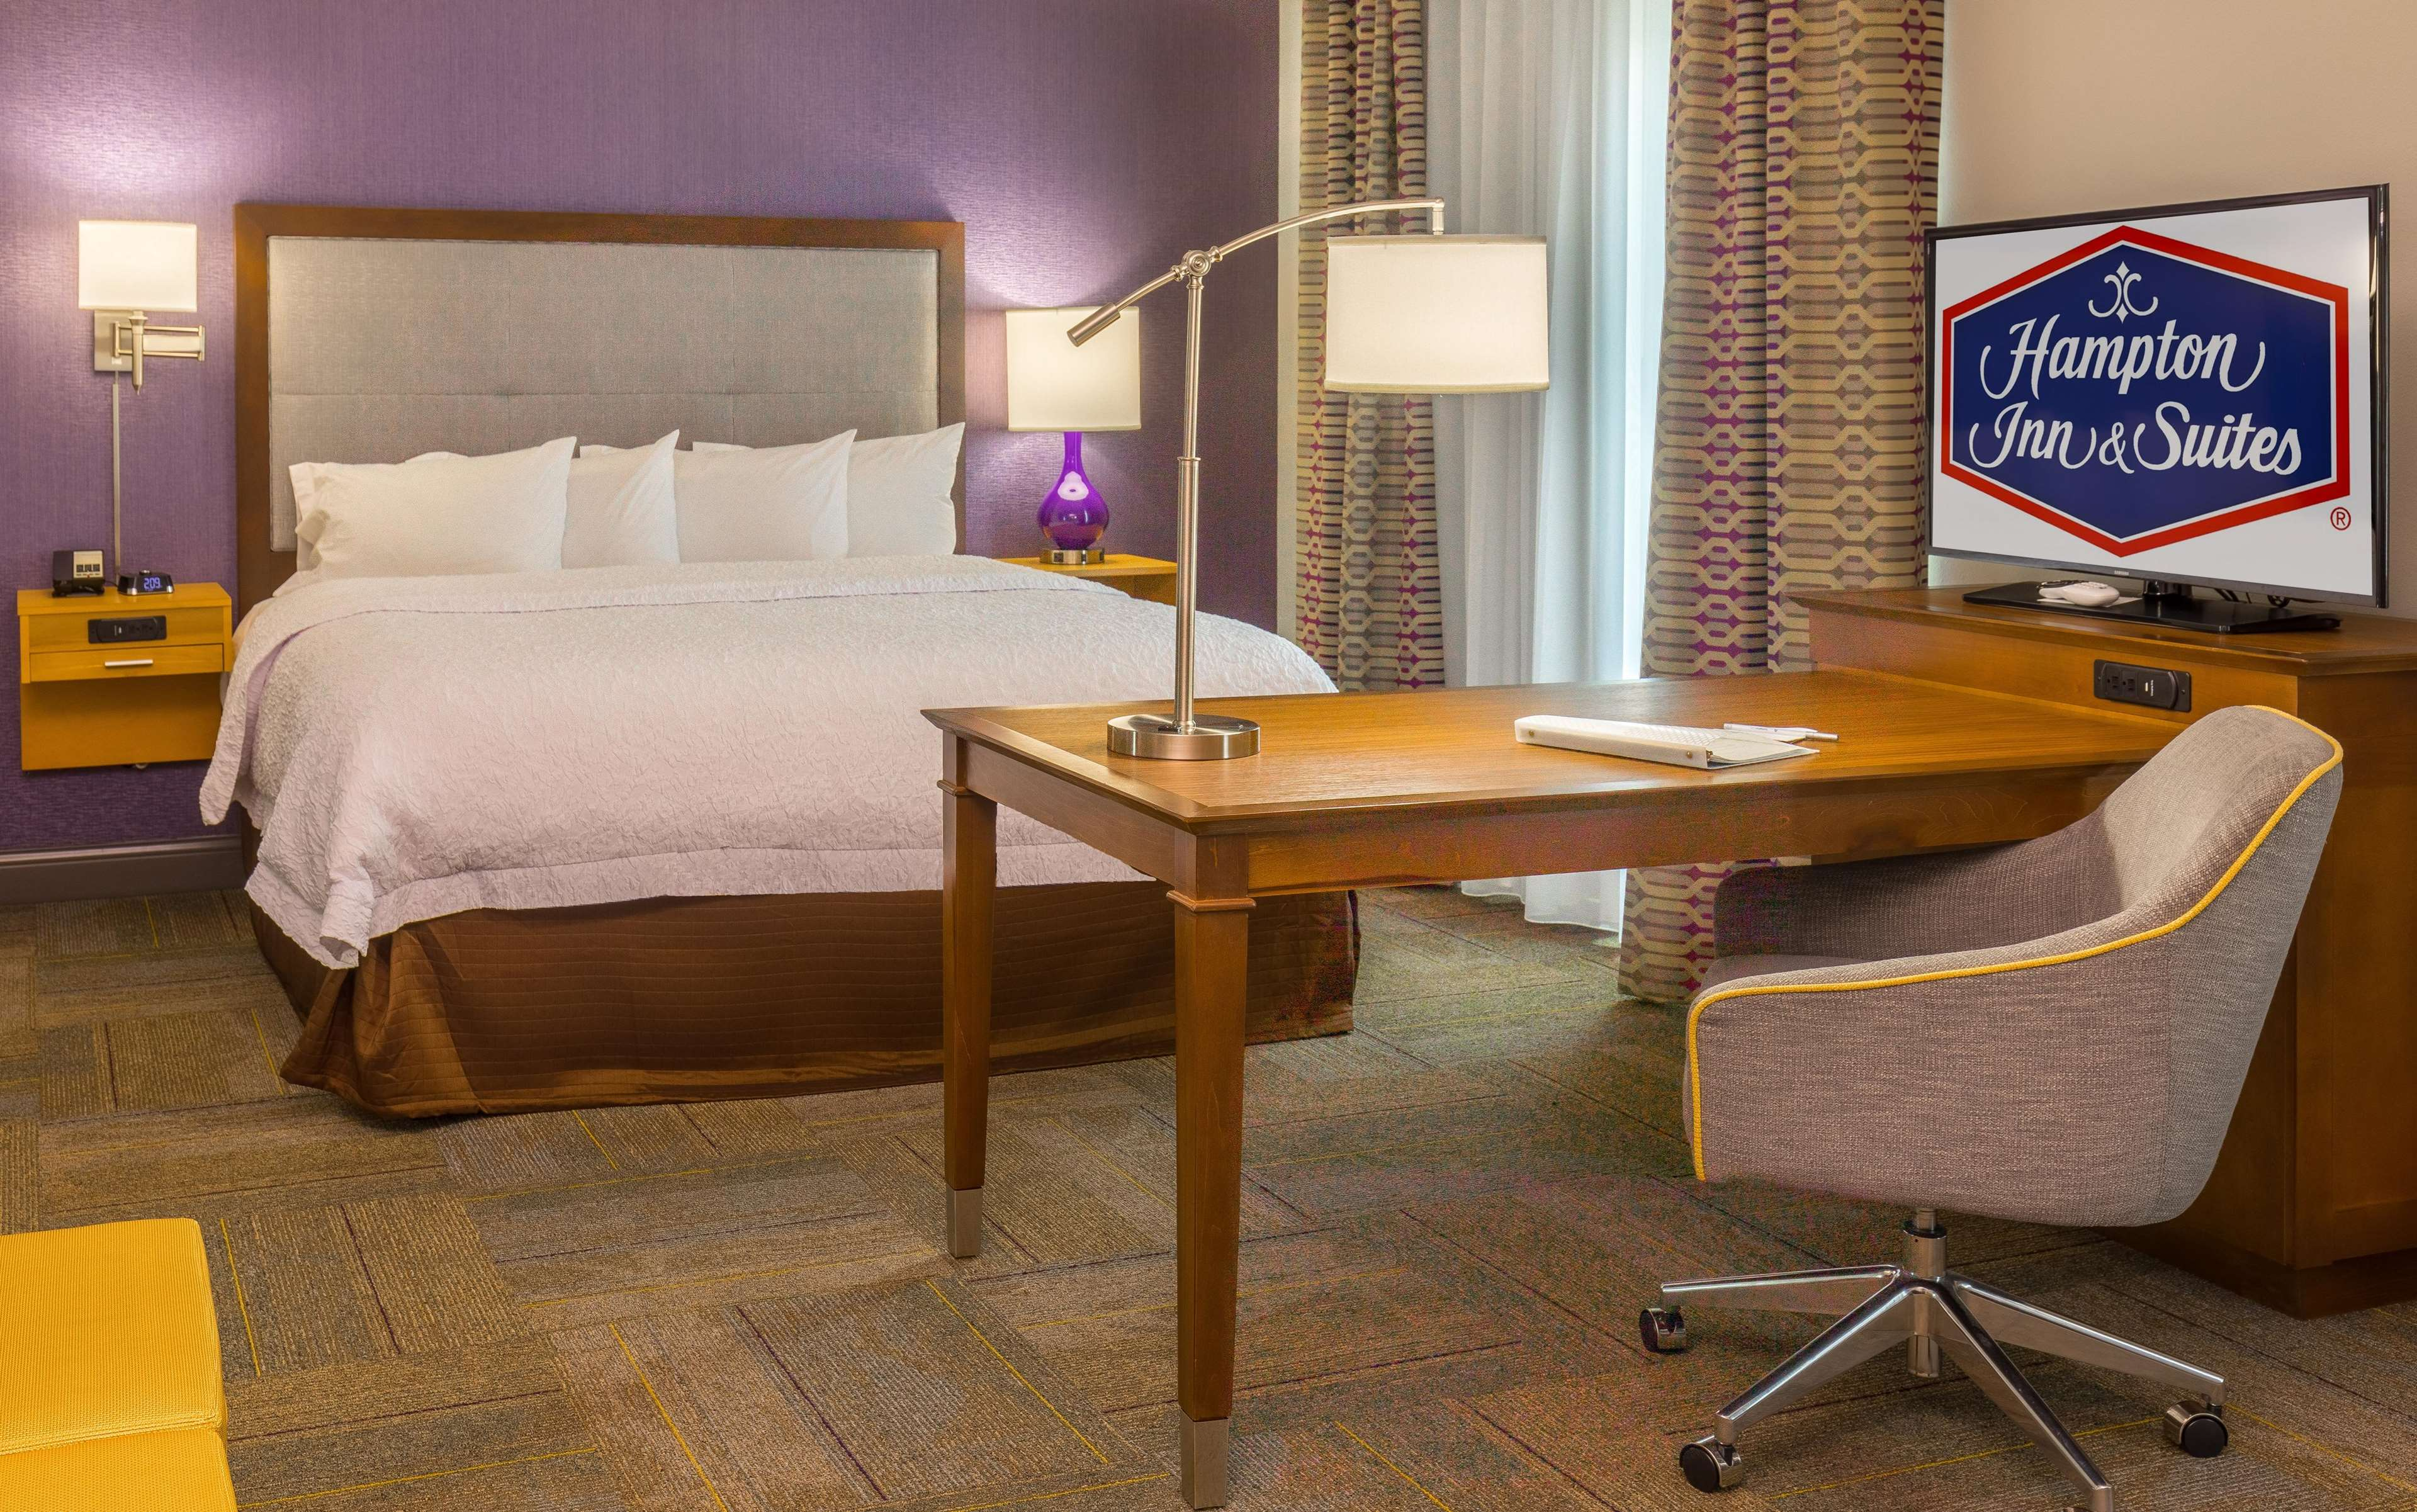 Hampton Inn & Suites Dublin image 15